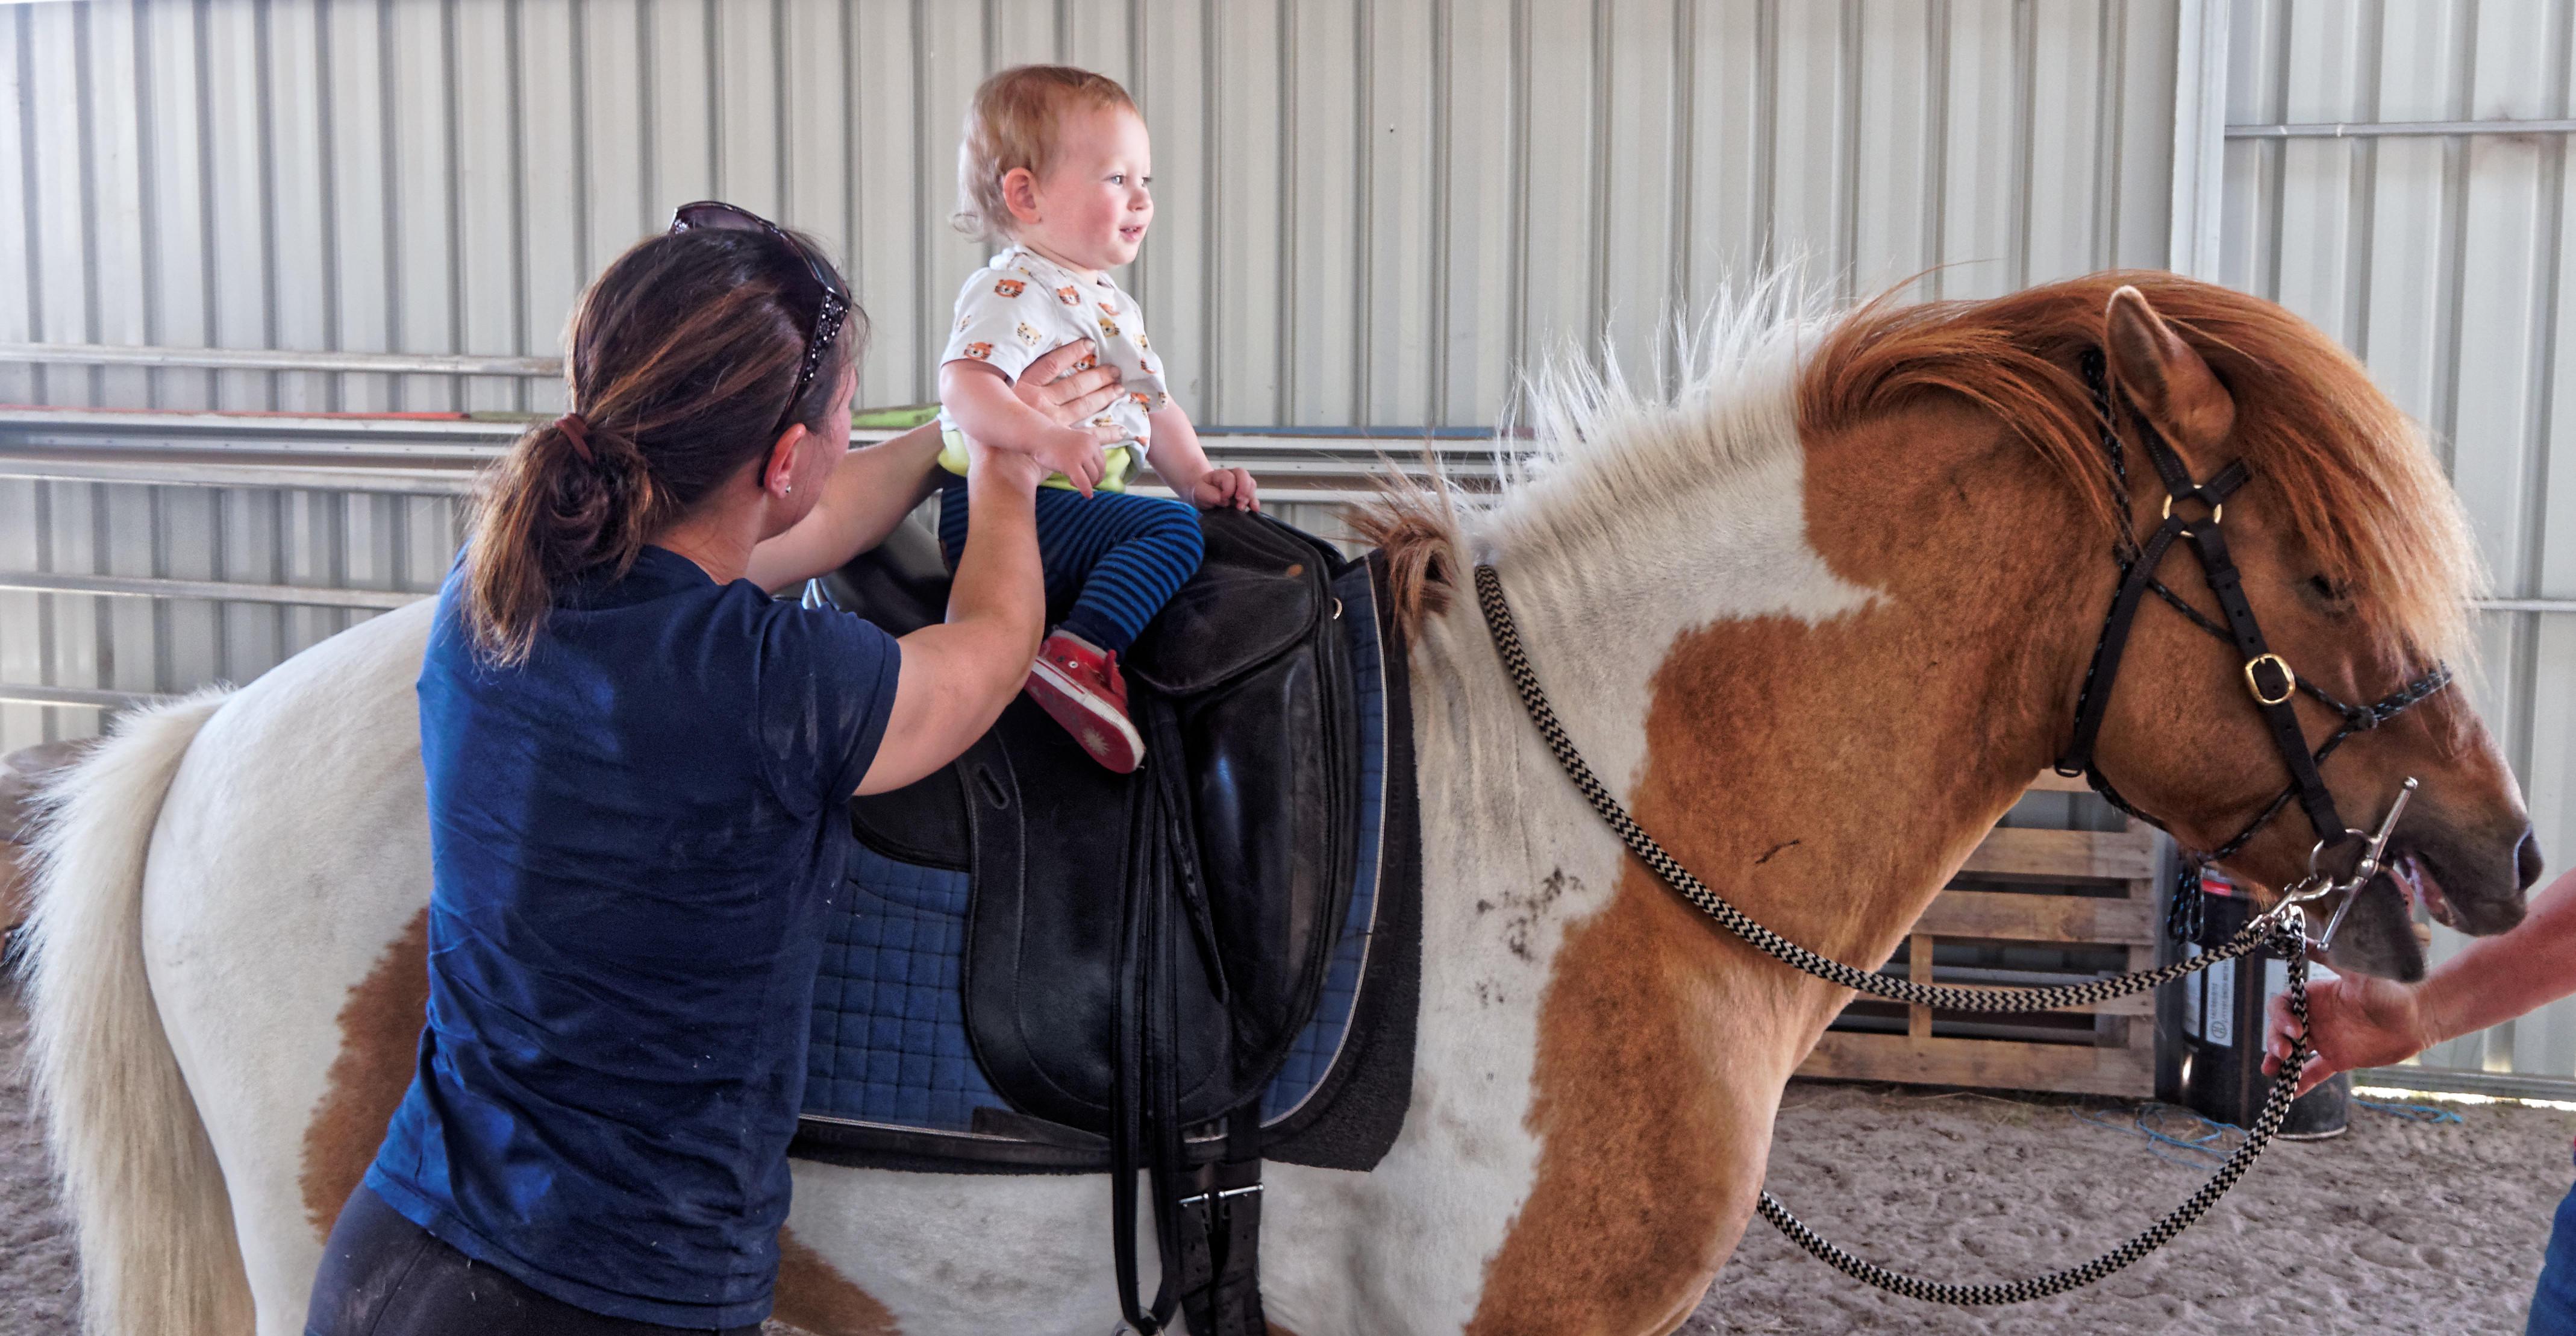 pony-ride-6.jpeg